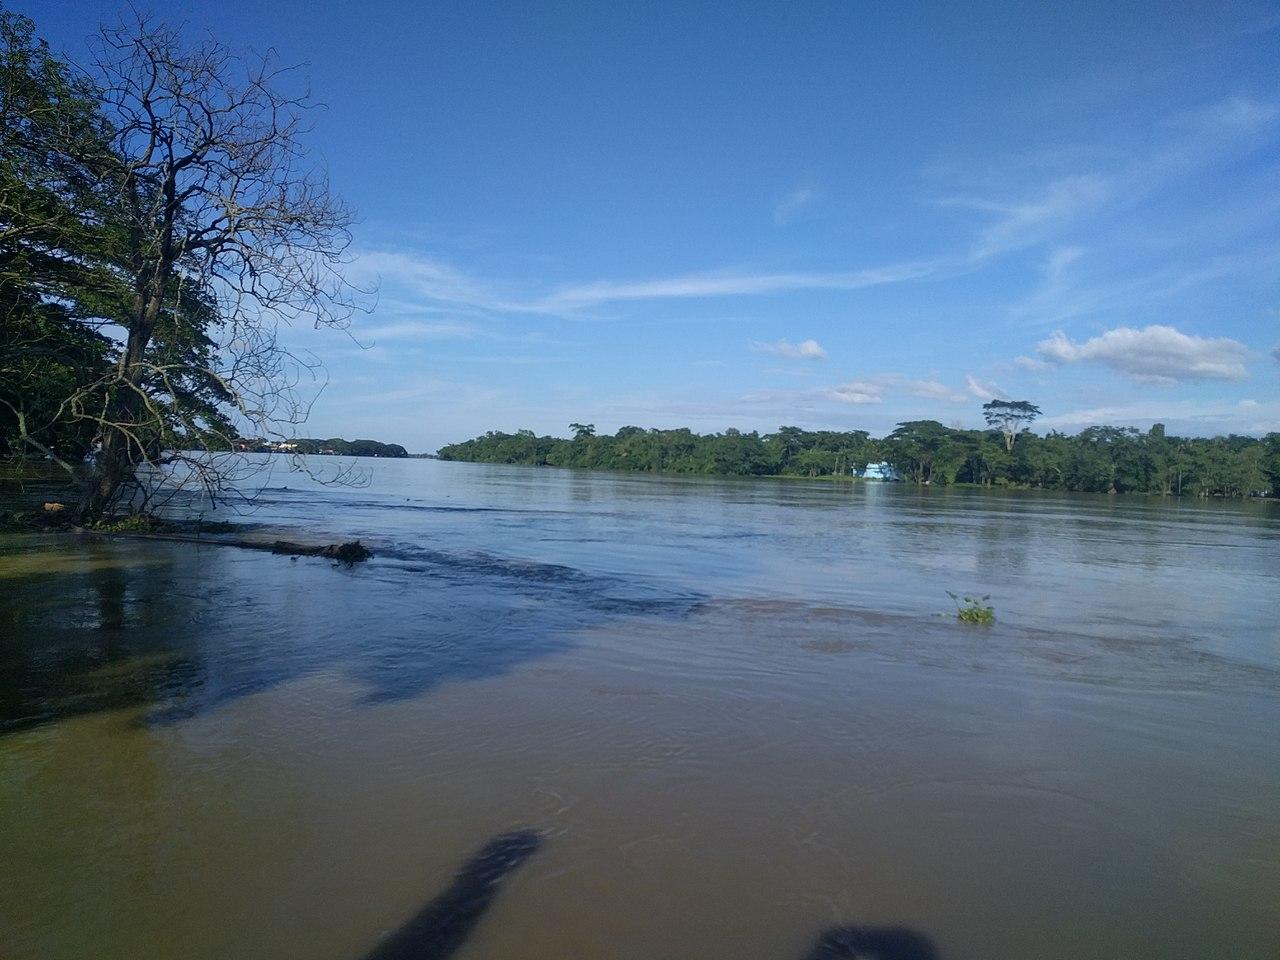 River Kushiara - Top Tourist Attraction in Karimganj